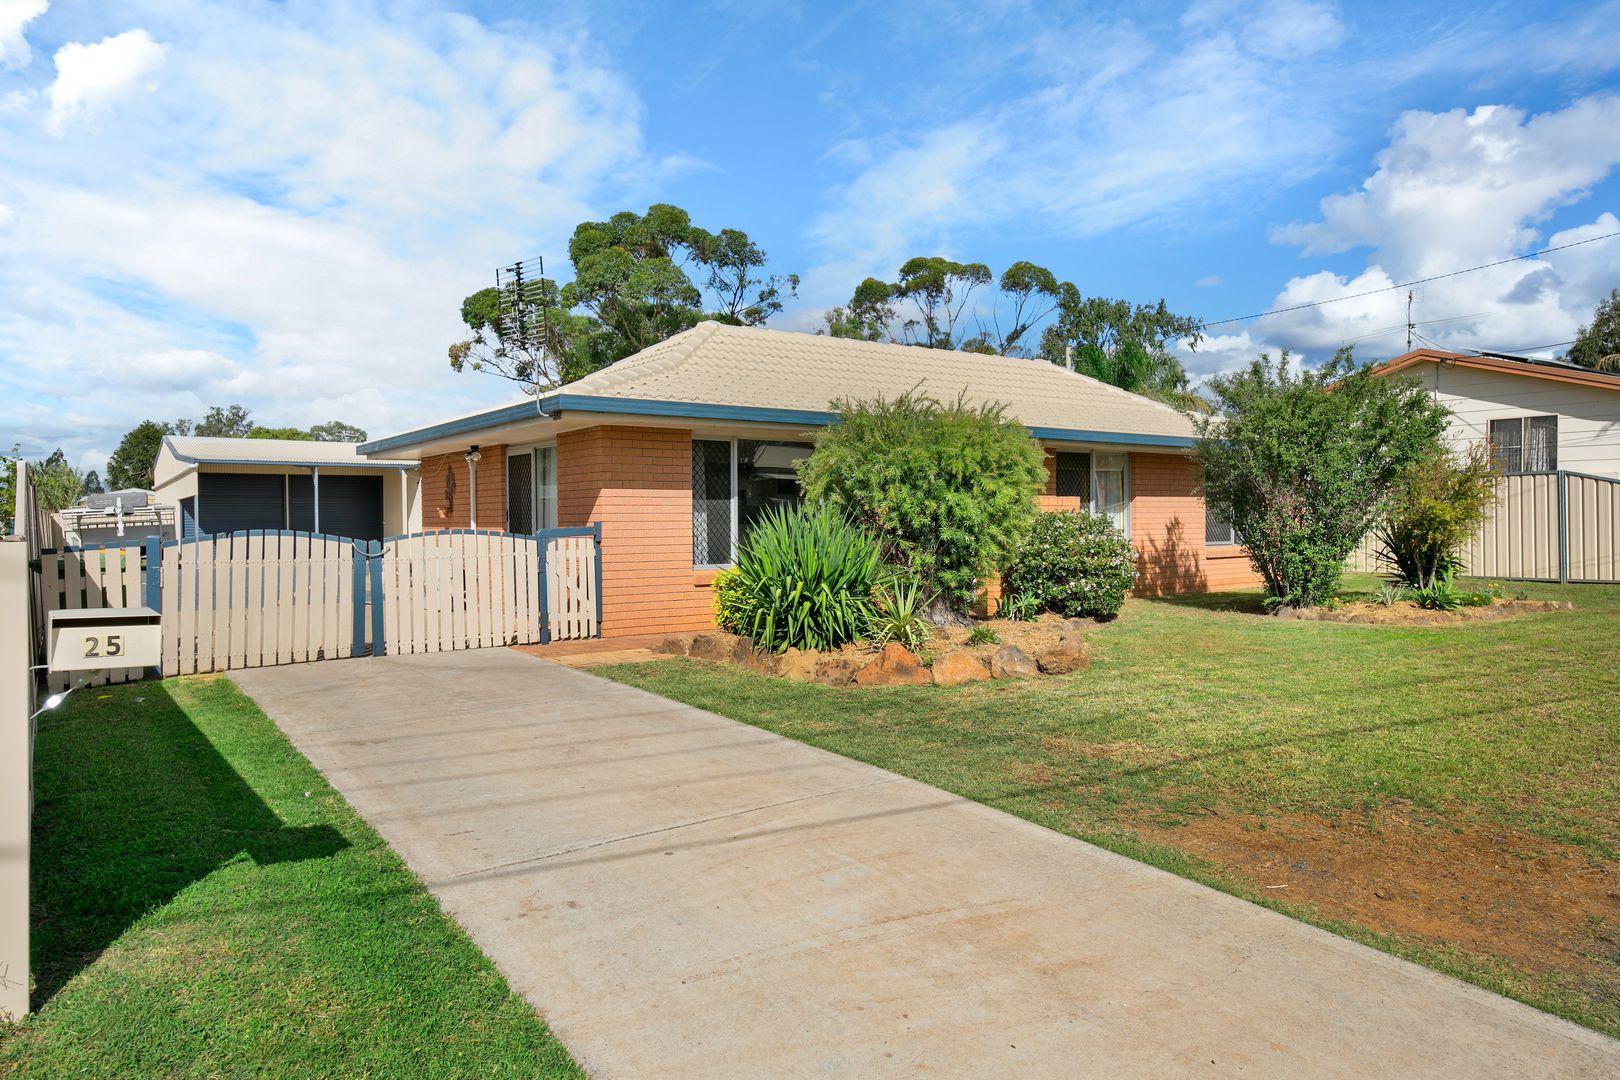 25 Desmond Lane, Oakey QLD 4401, Image 0